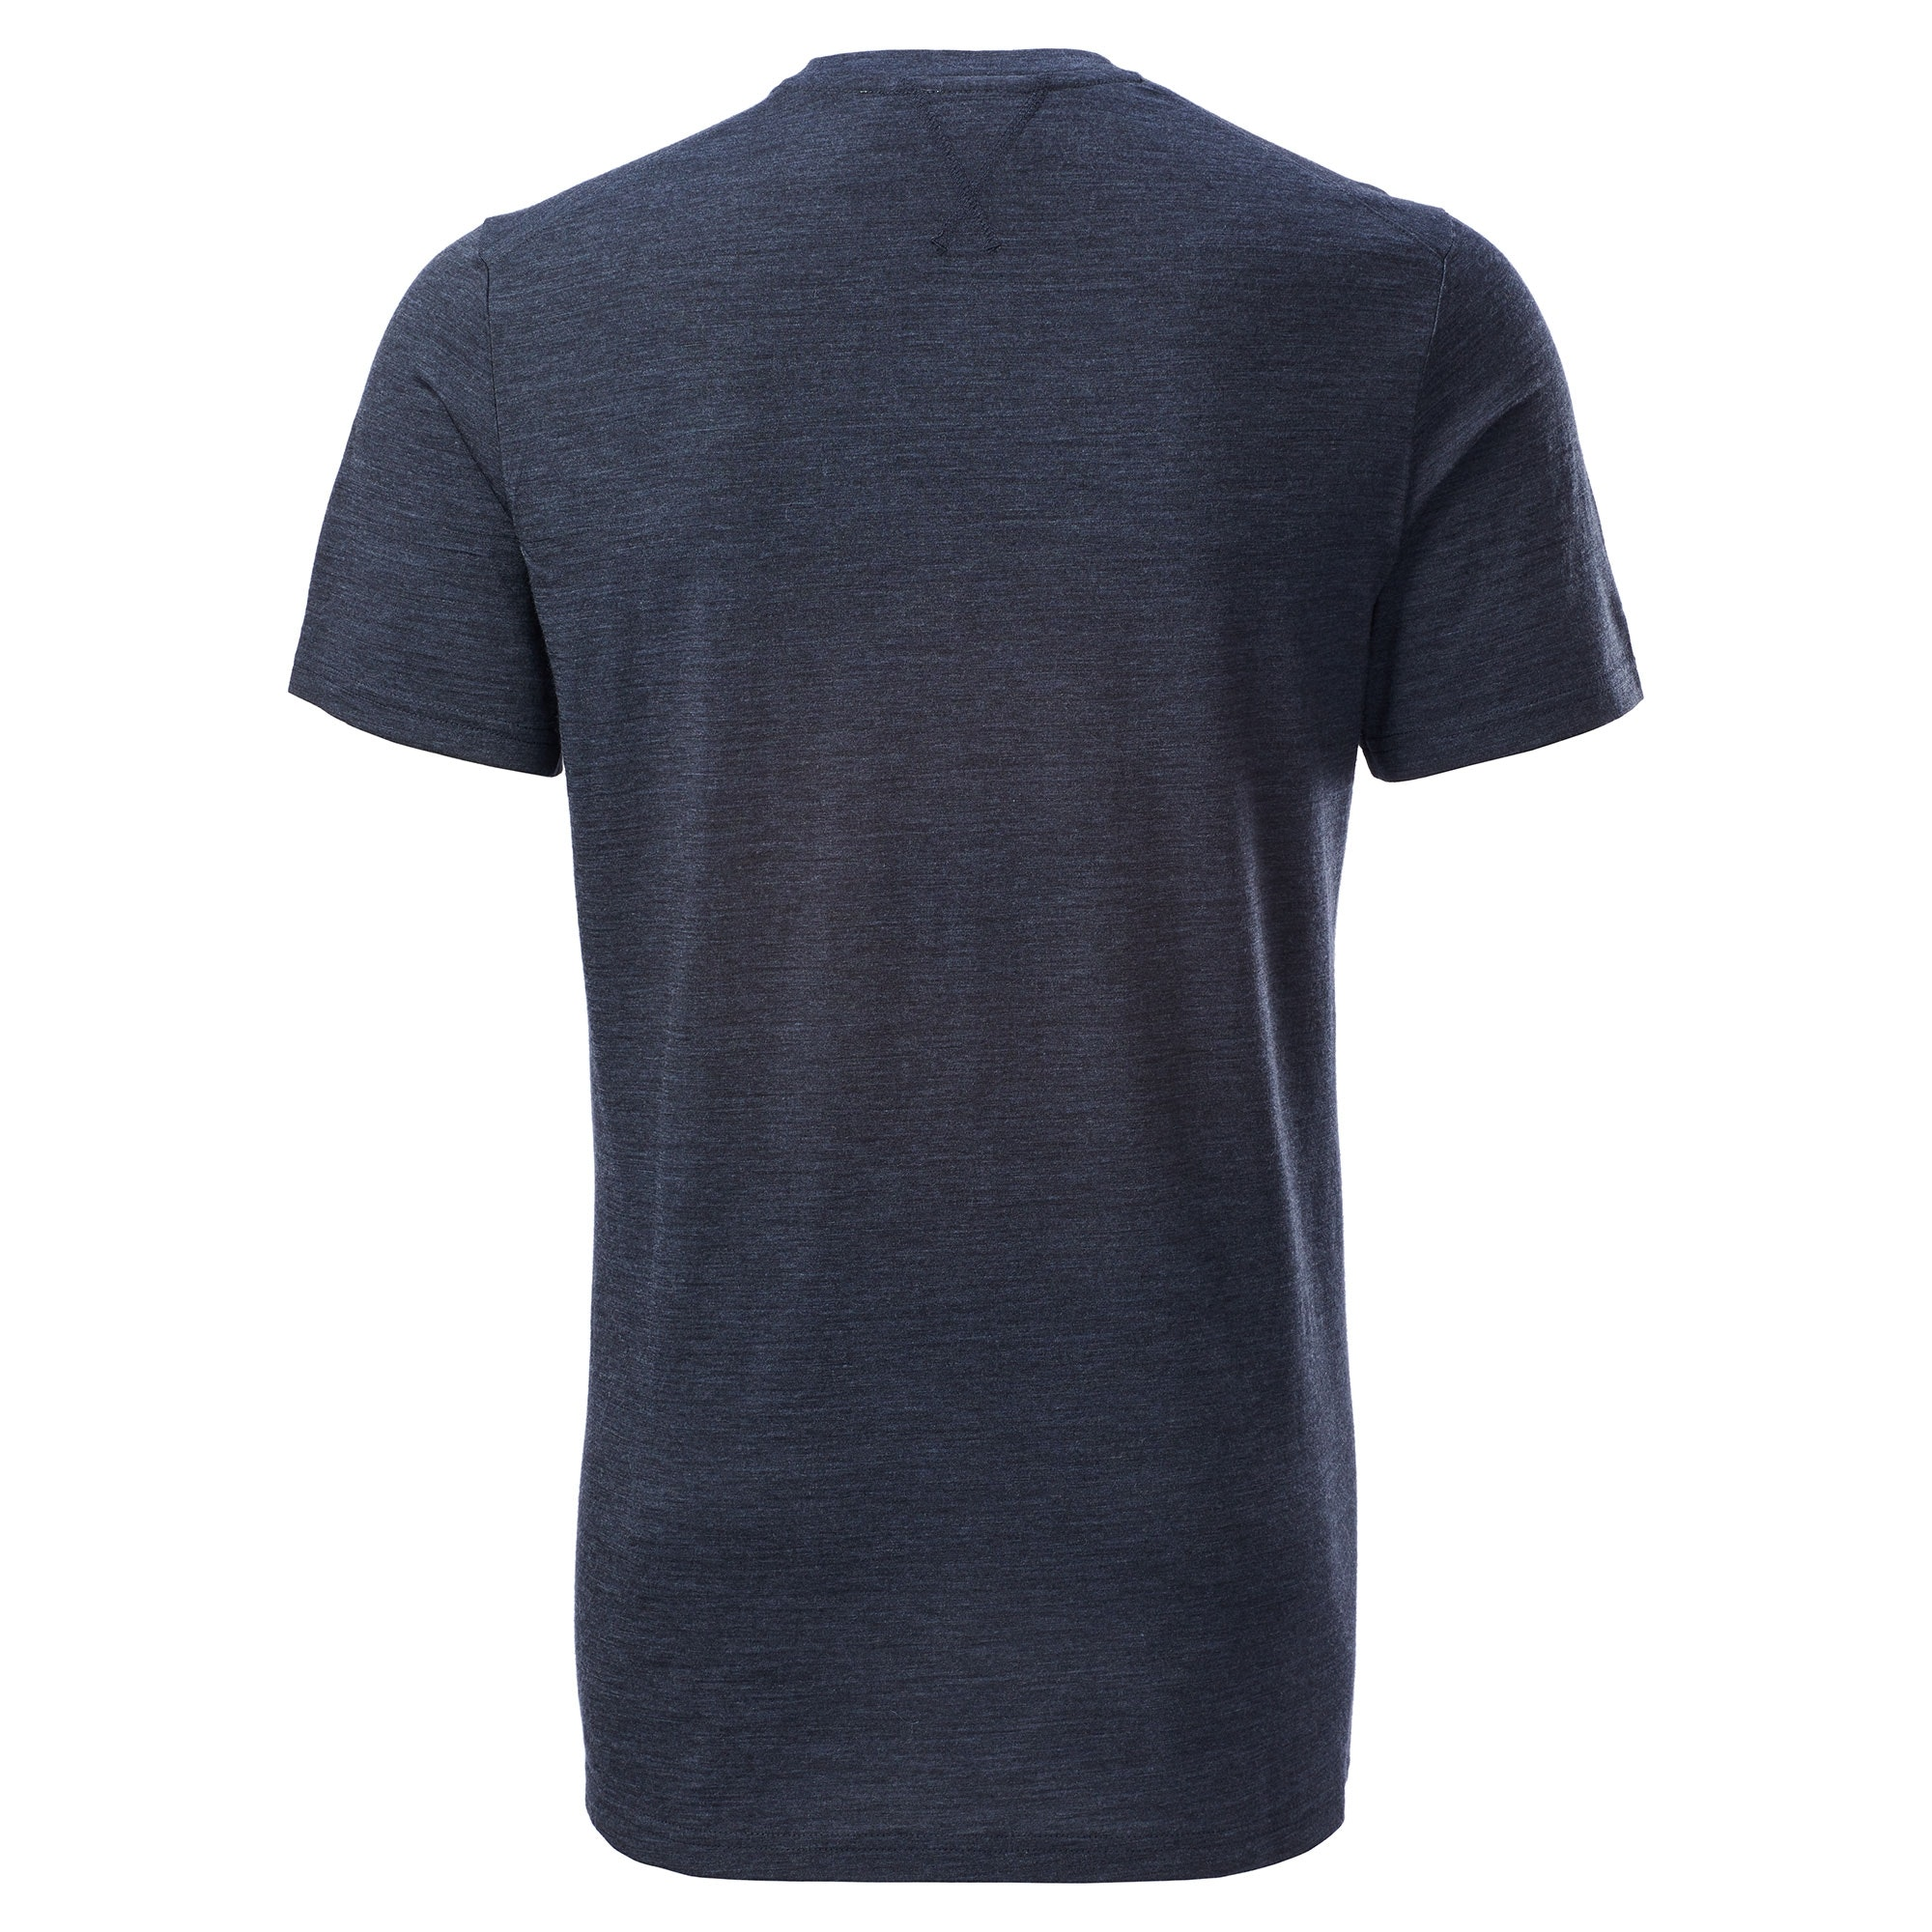 thumbnail 11 - NEW Kathmandu Core Spun Merino Wool Blend Short Sleeve Durable Men's Crew Top